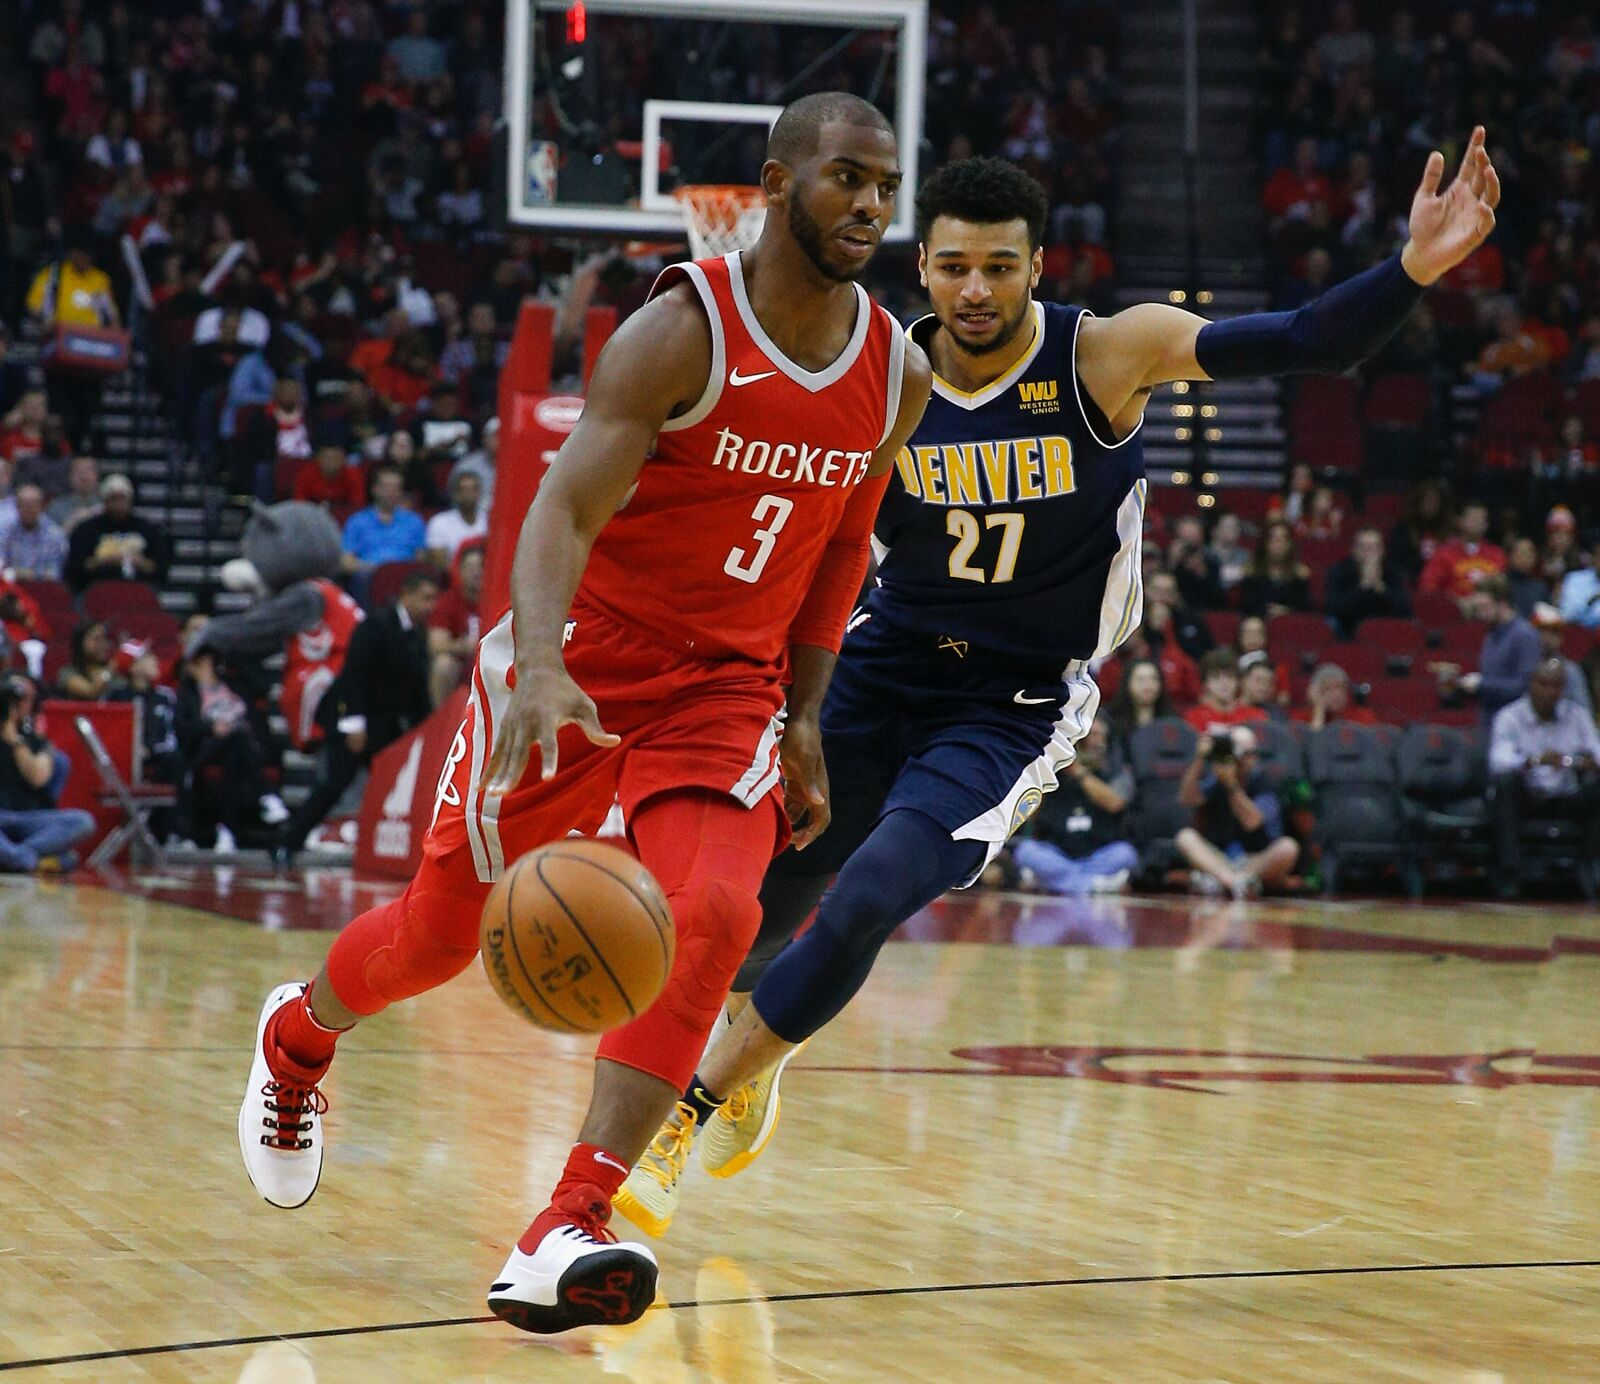 Denver Nuggets Vs. Rockets: Match Up To Watch At Denver